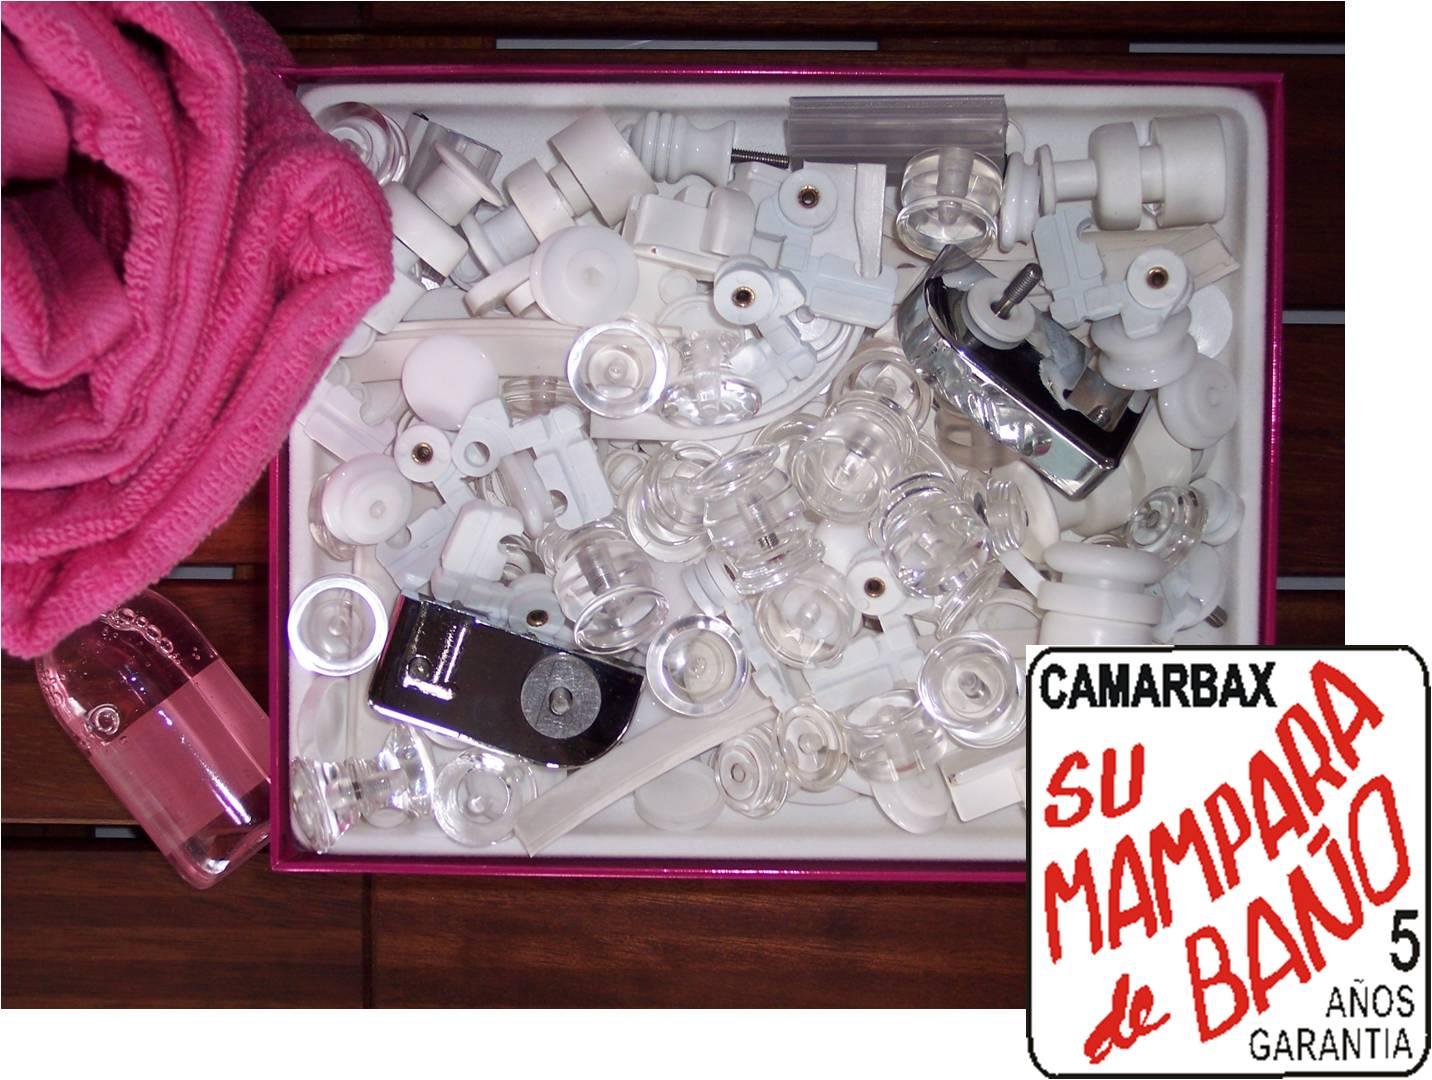 Garantia Mamparas De Ba O Camarbax ~ Rodamientos De Mamparas De Ducha